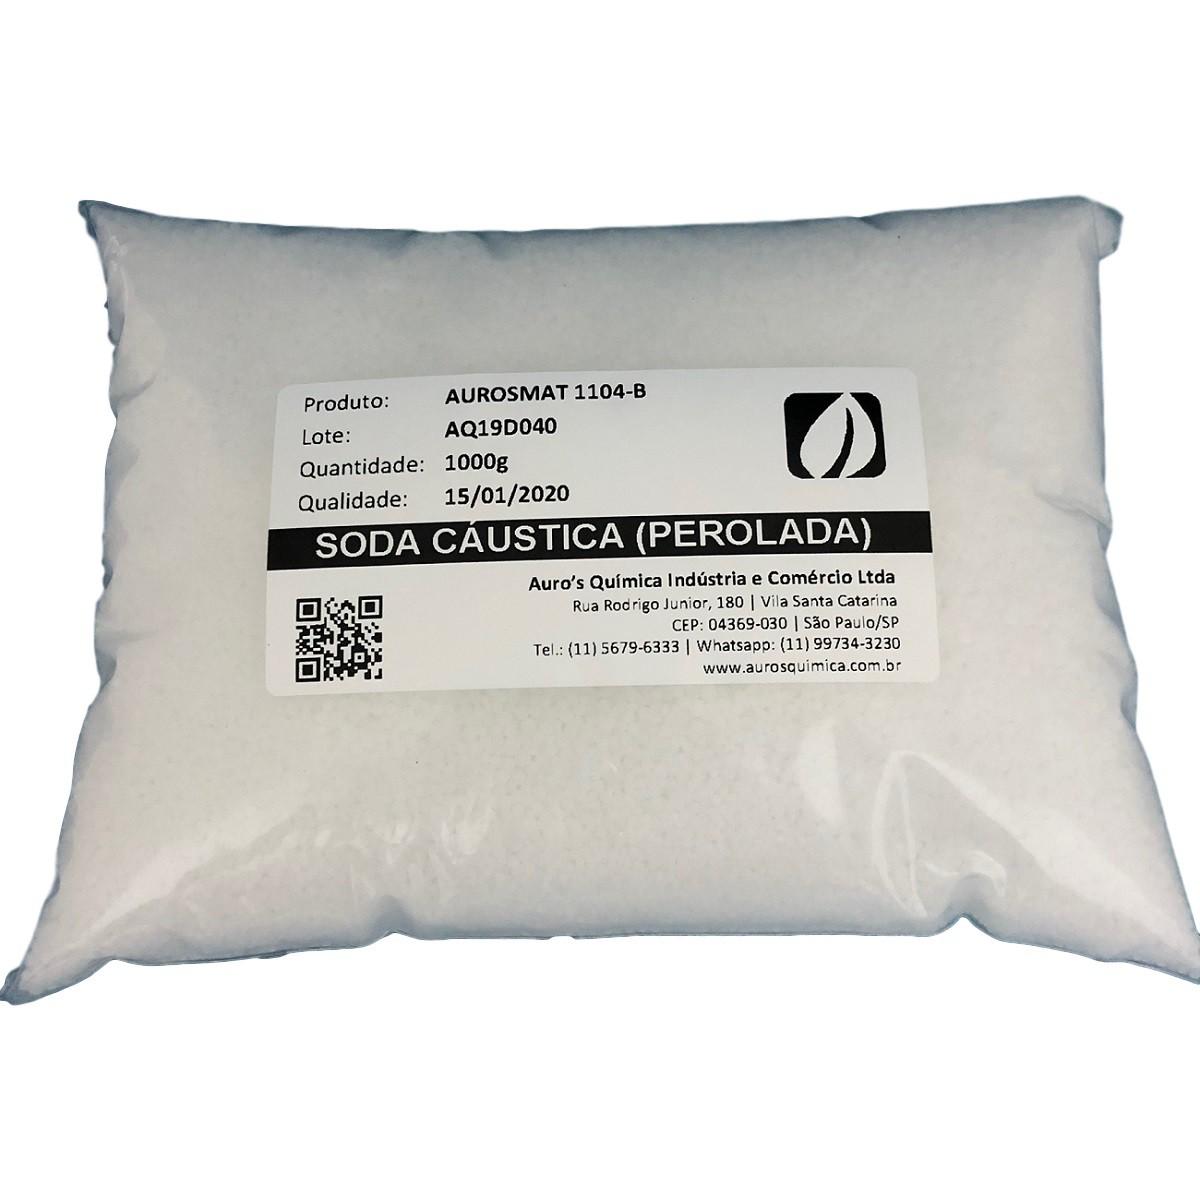 Soda Cáustica Perolada 99% - 100 Pacotes 1 Kg